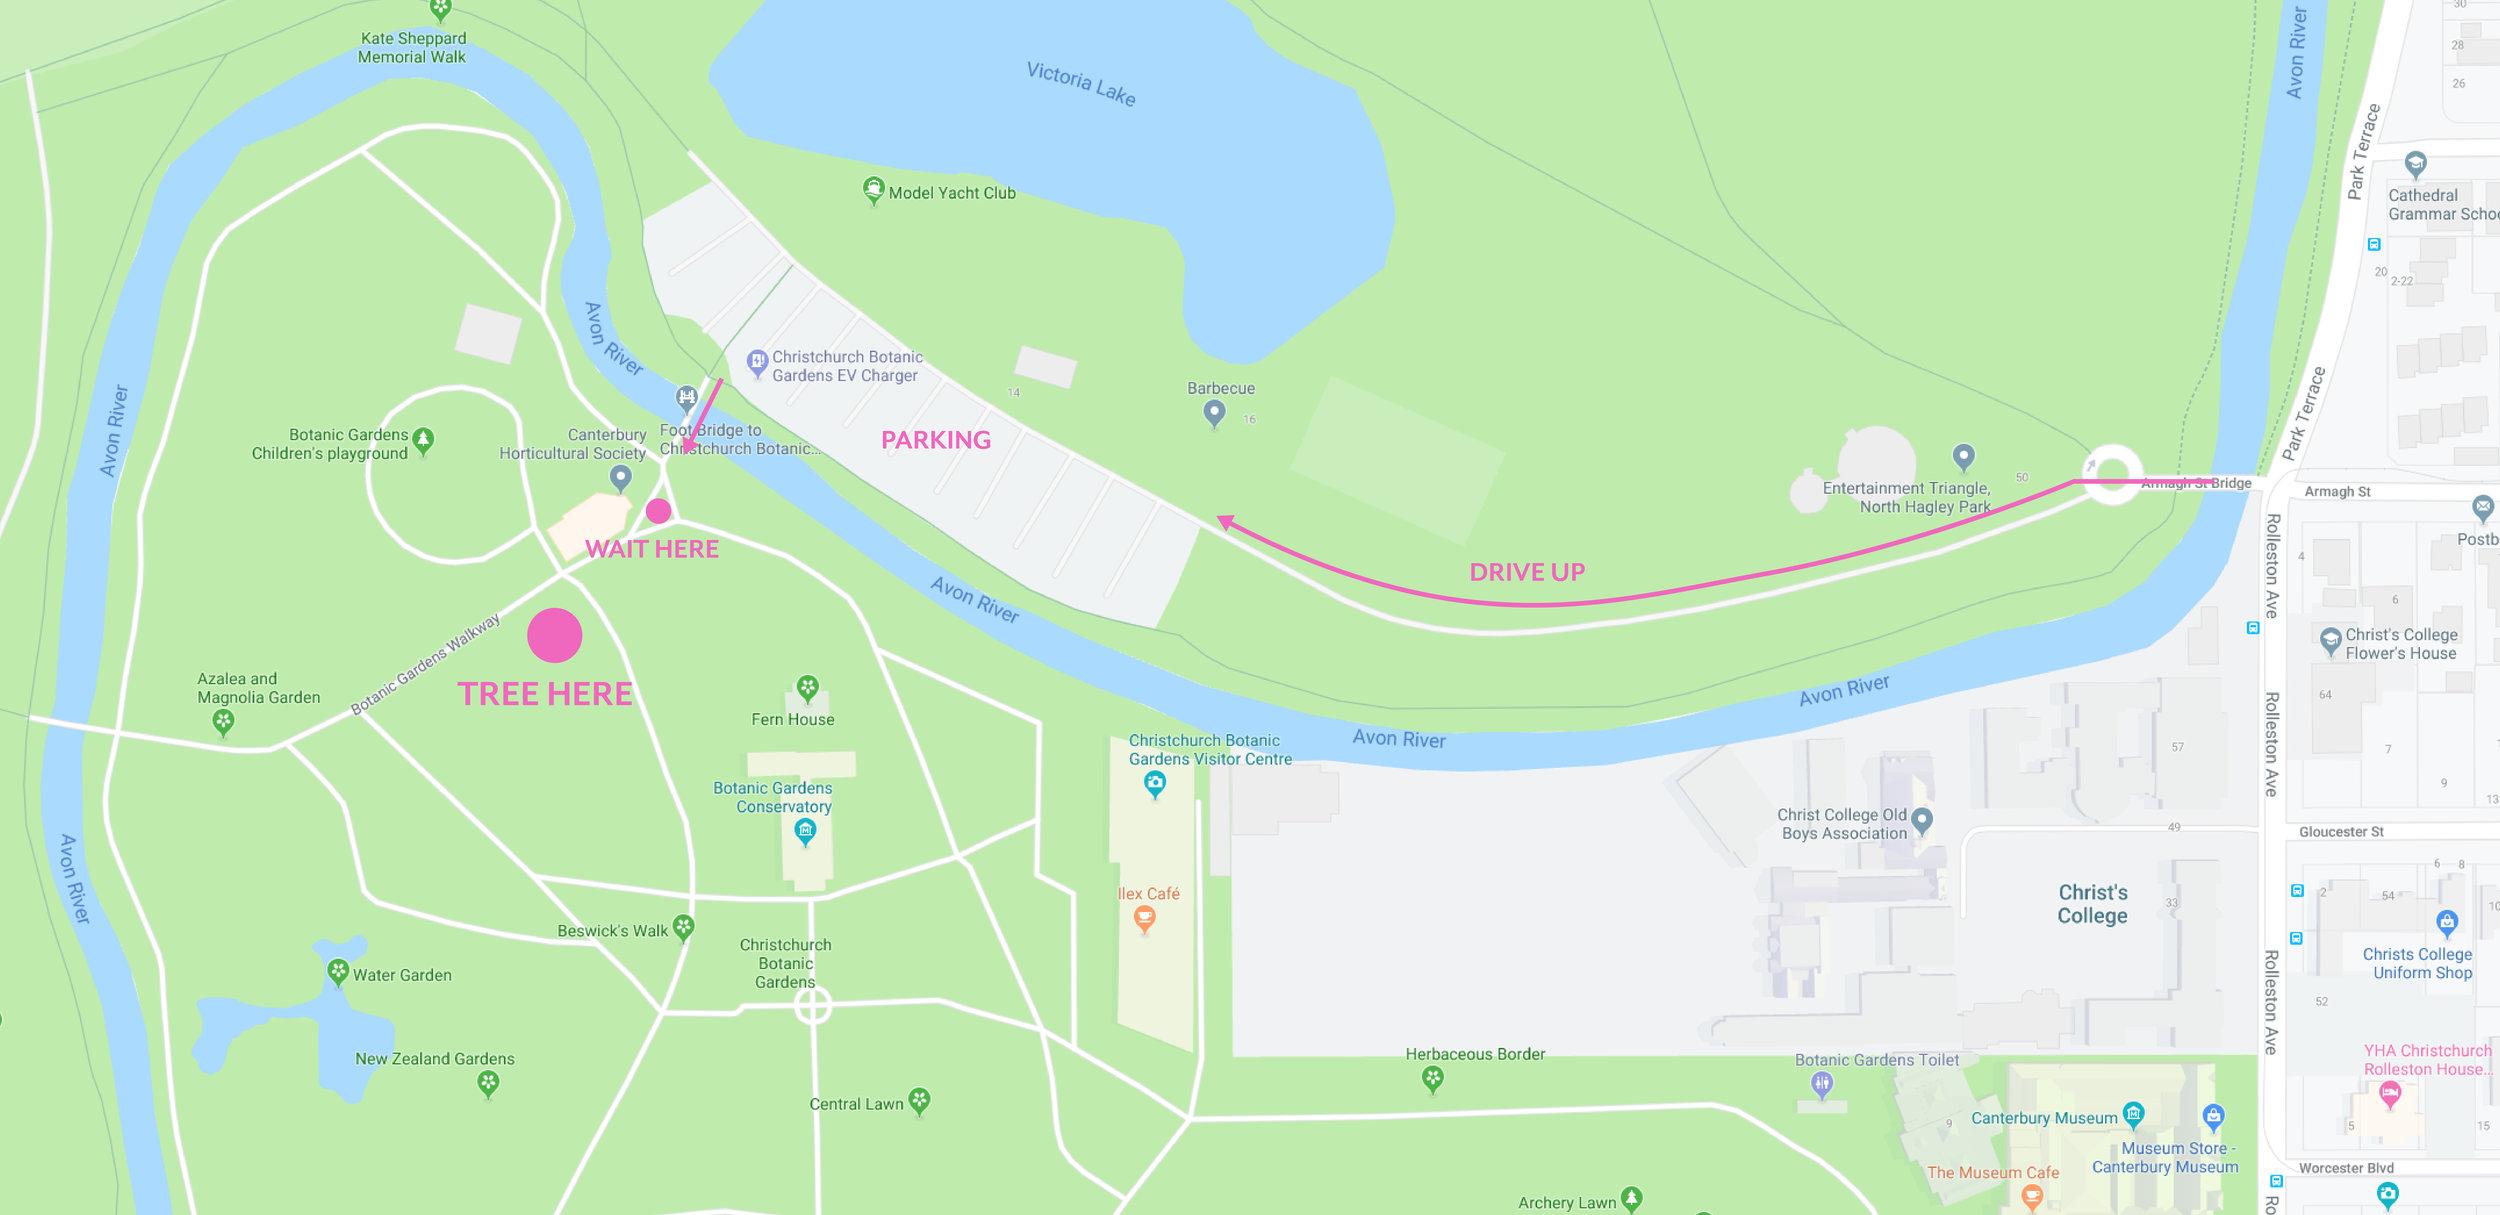 directions2-01.jpg